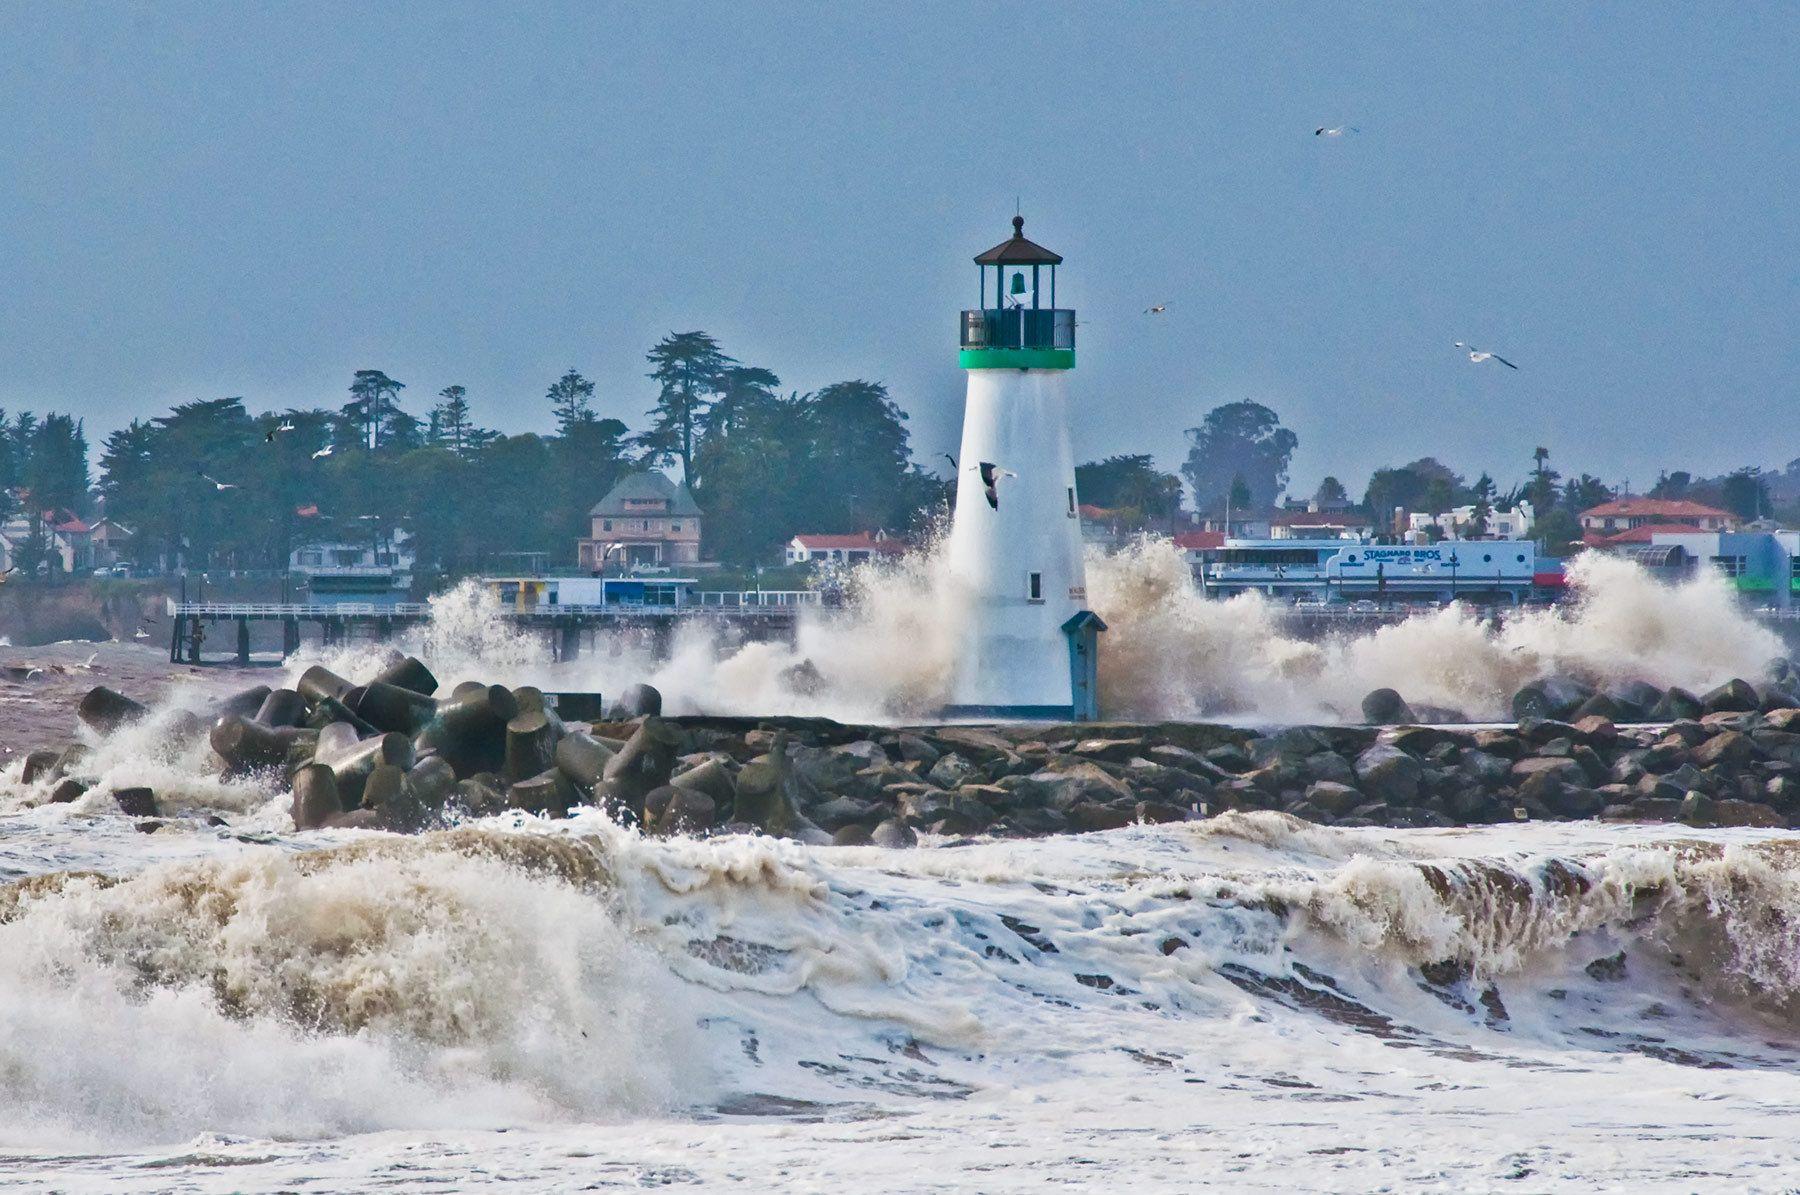 Stormy Day, Walton Lighthouse, Santa Cruz, California